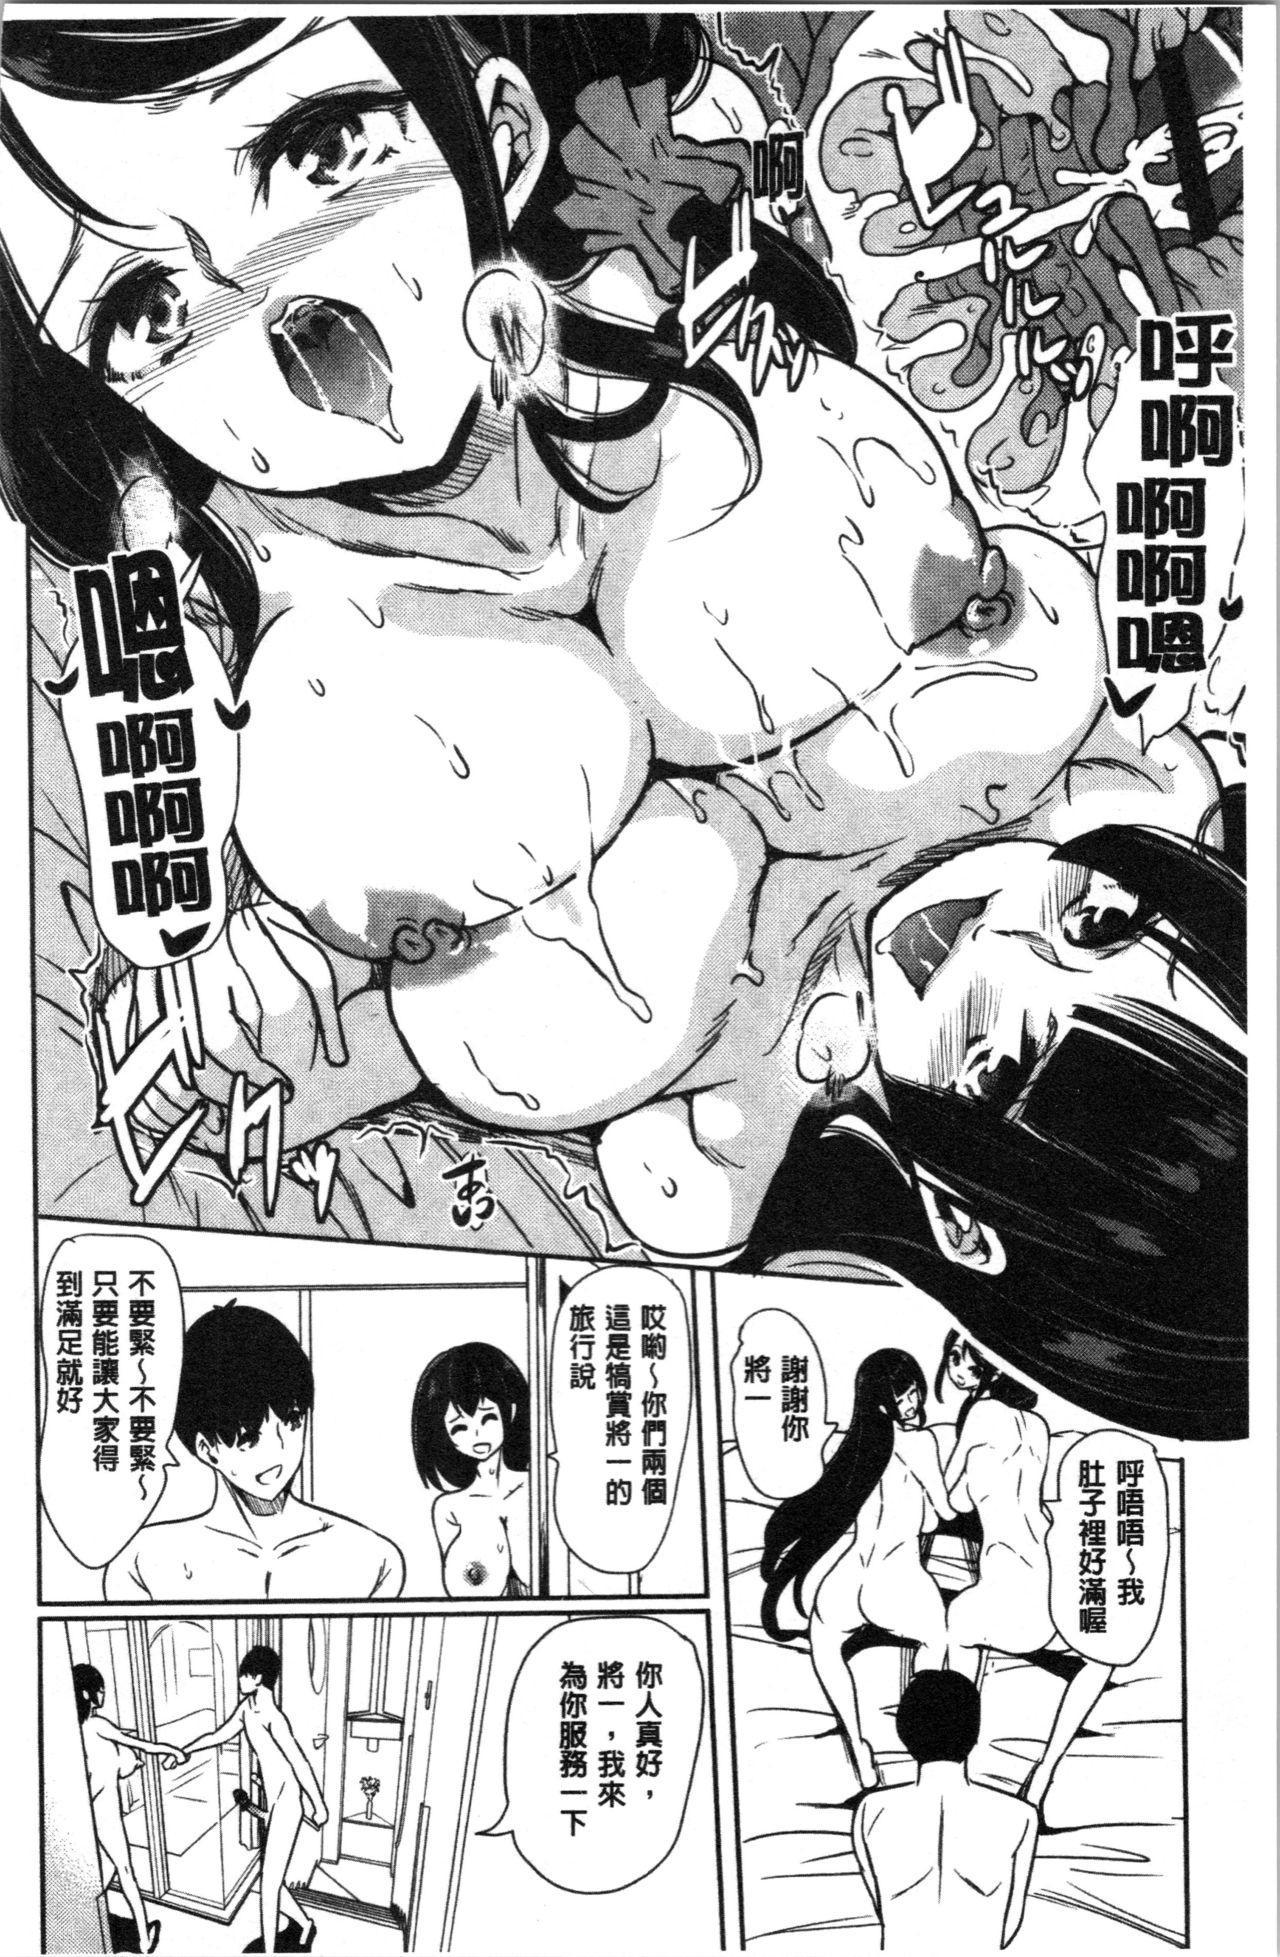 [Ootori Mahiro] Boku no Super Harem Sentou ~Otome no Naka ni Otoko wa Boku dake~ - My super harlem public bath, I am the only man in the public bath full of pussy cats. | 我的後宮選妃般的超級錢湯~乙女之間只有我一個男人~ [Chinese] 167